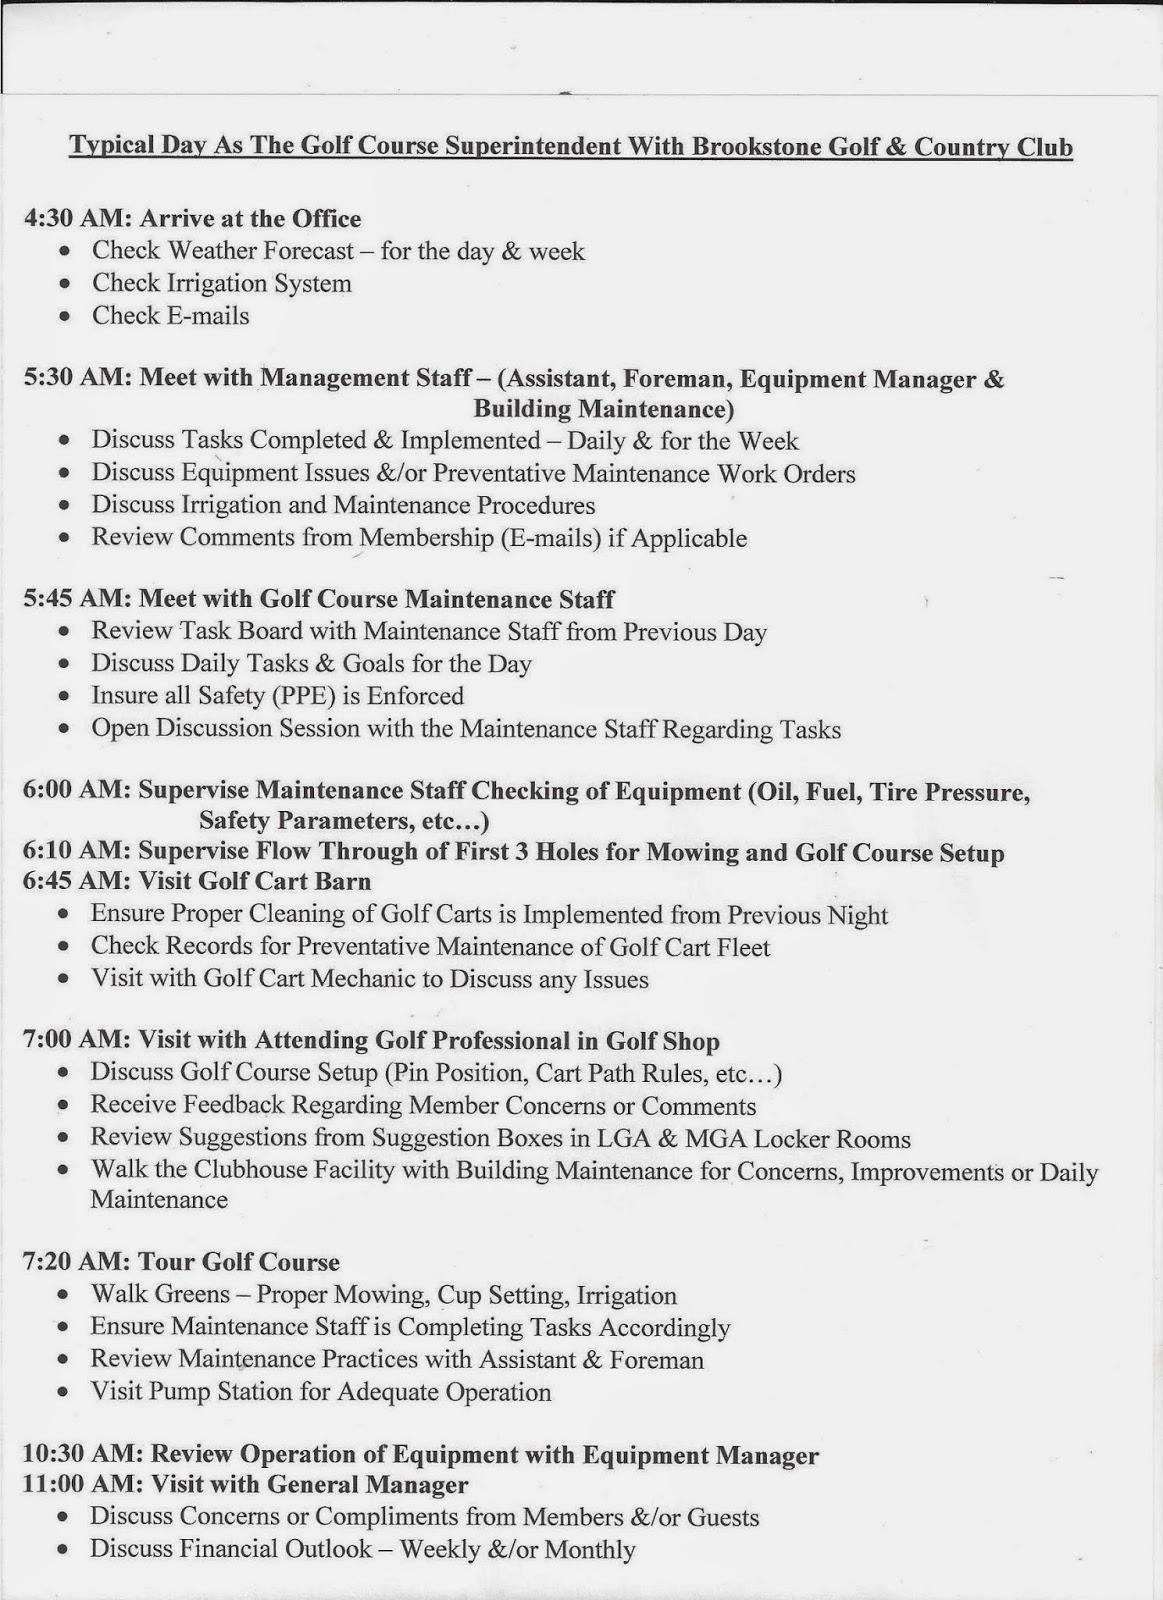 Brookstone Golf & Country Club Golf Course Maintenance: June